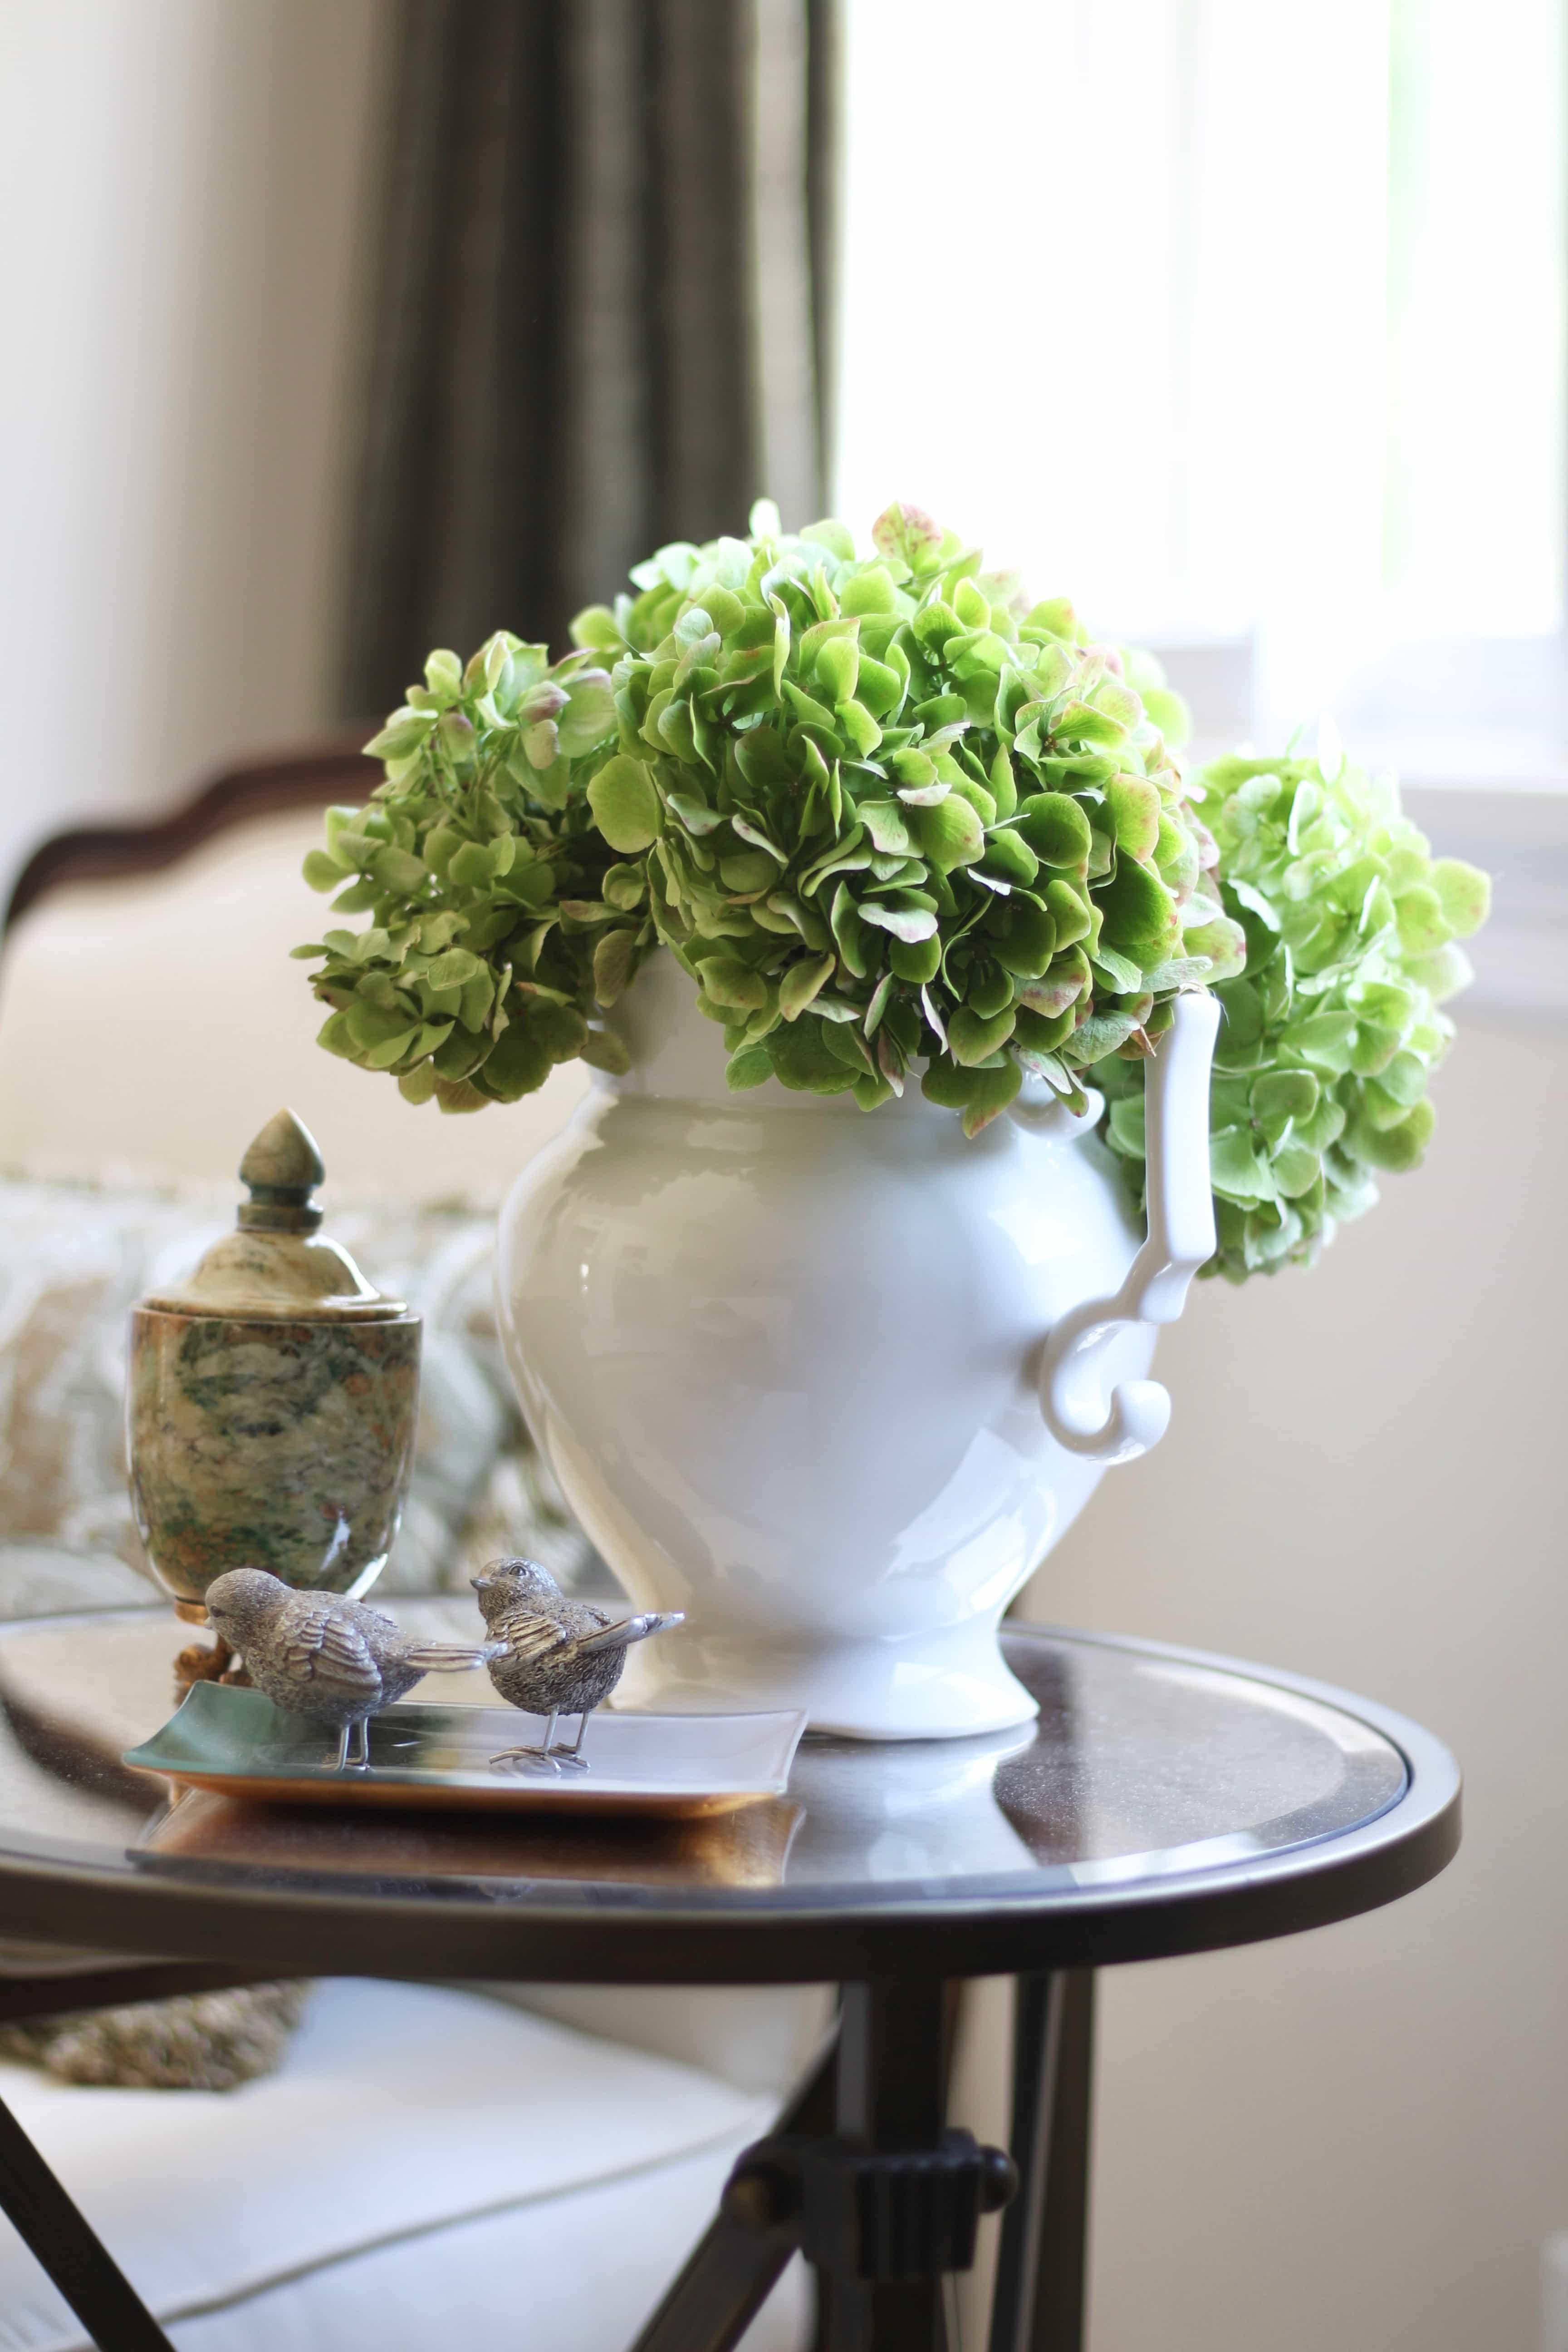 green-hydrangeas-flowers-decorating